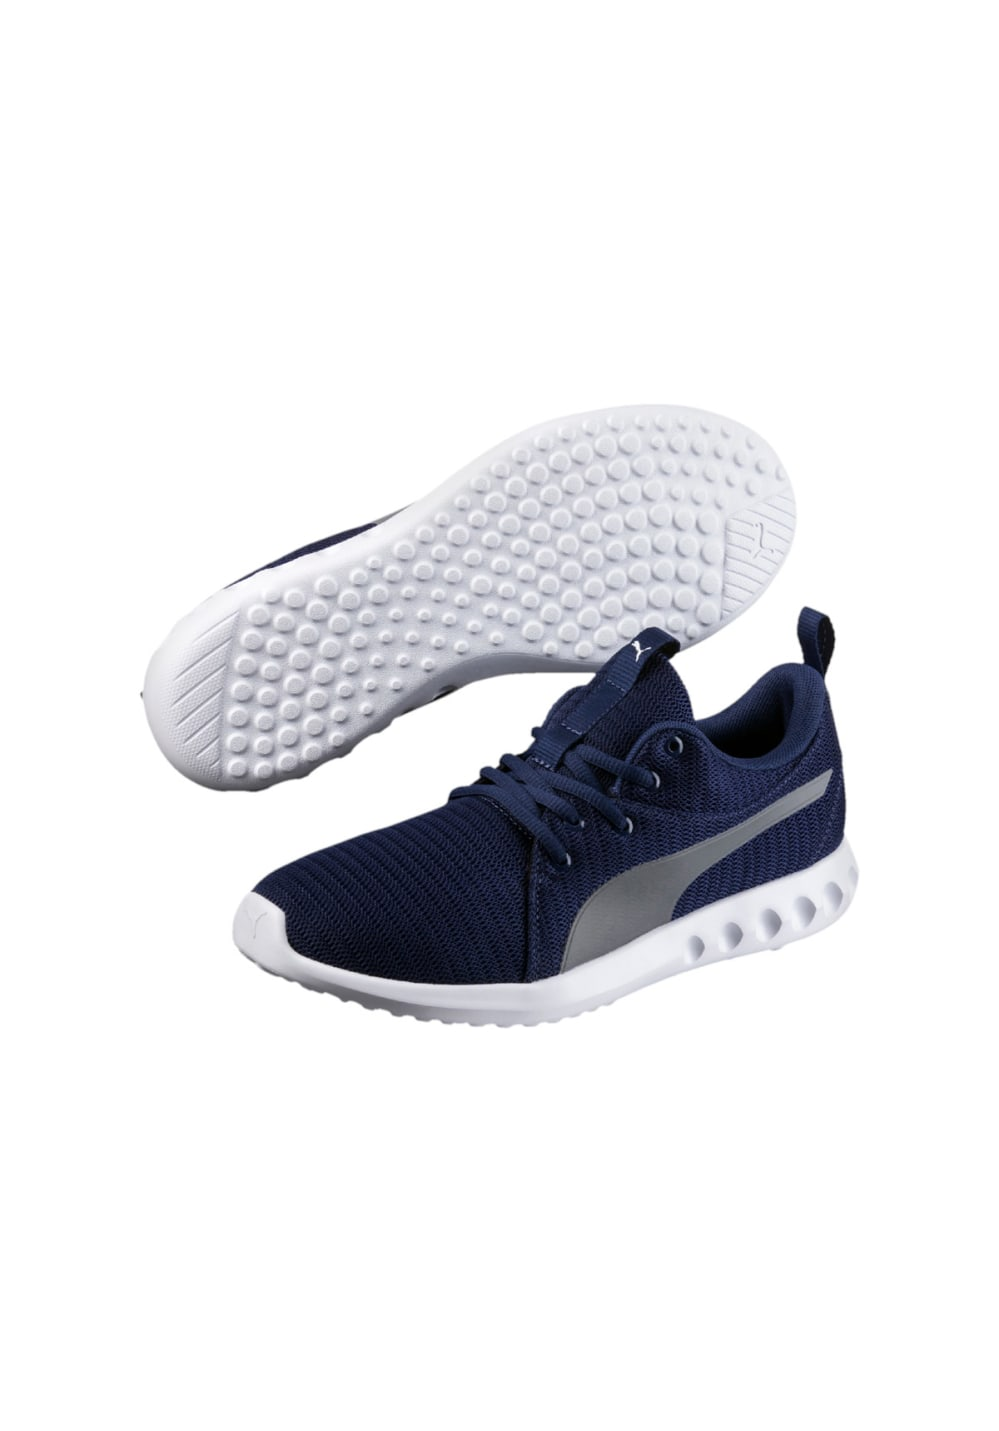 e929fc44a9 Puma Carson 2 - Running shoes for Men - Blue